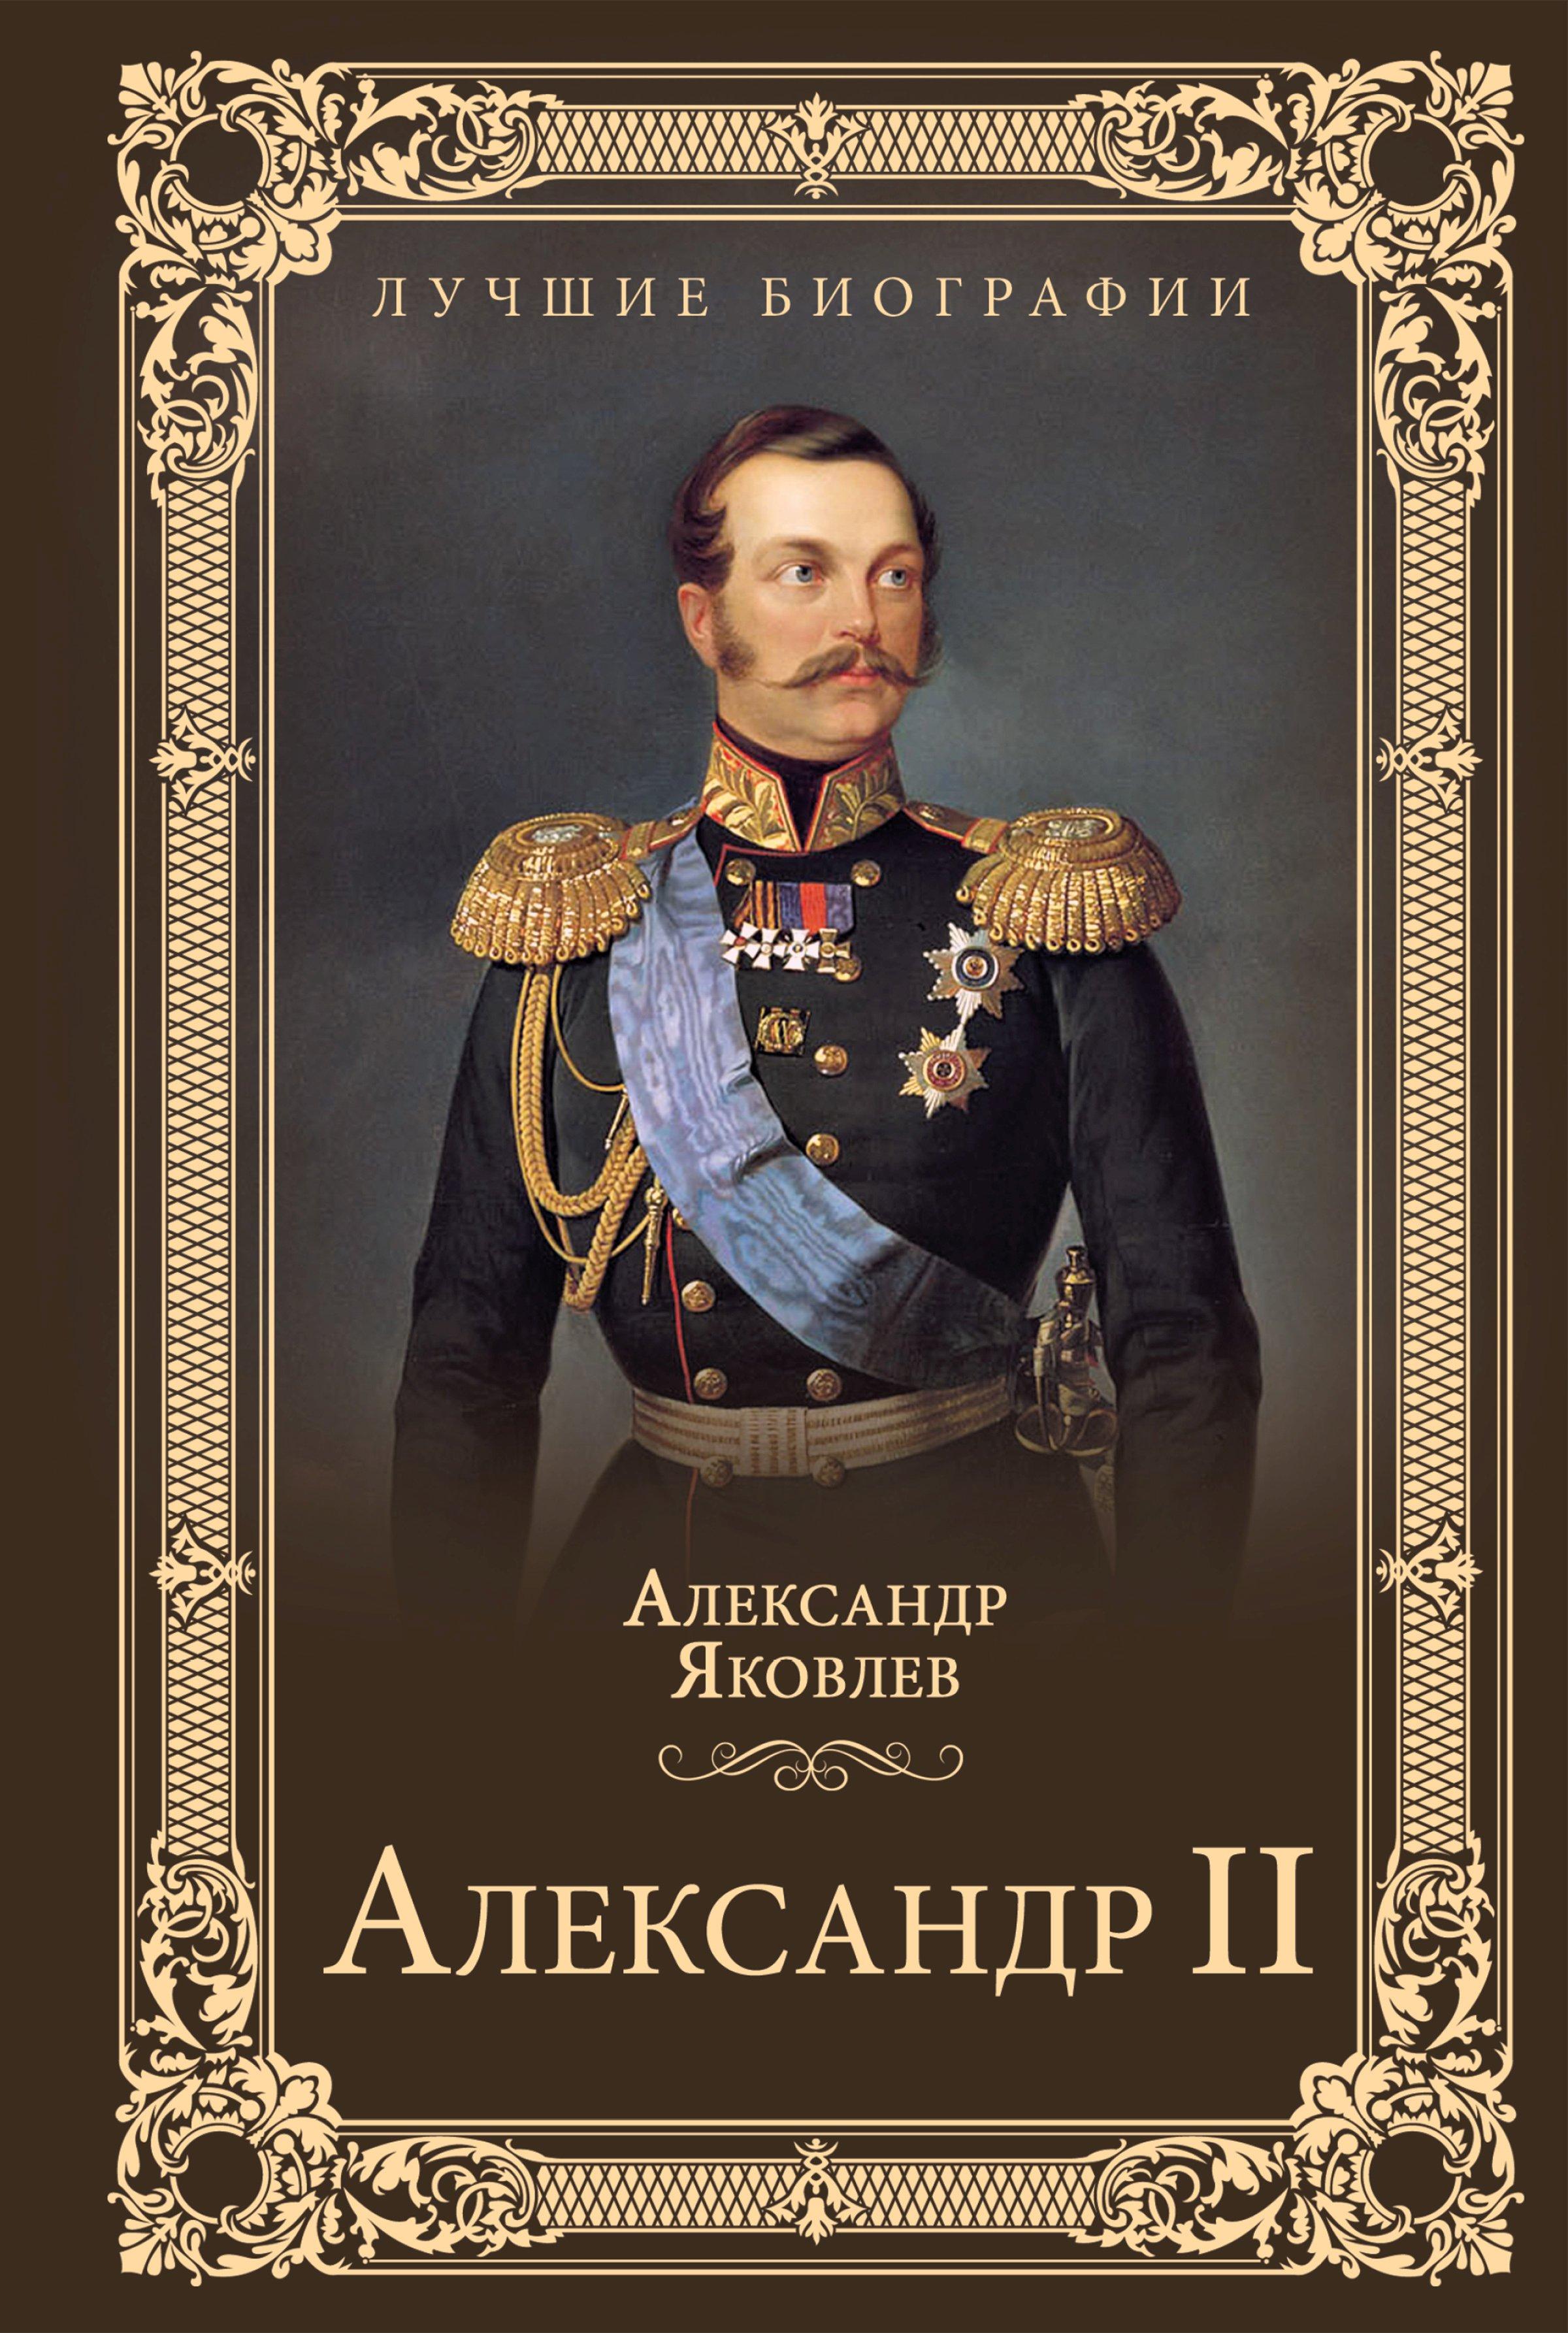 яковлев александр николаевич биография